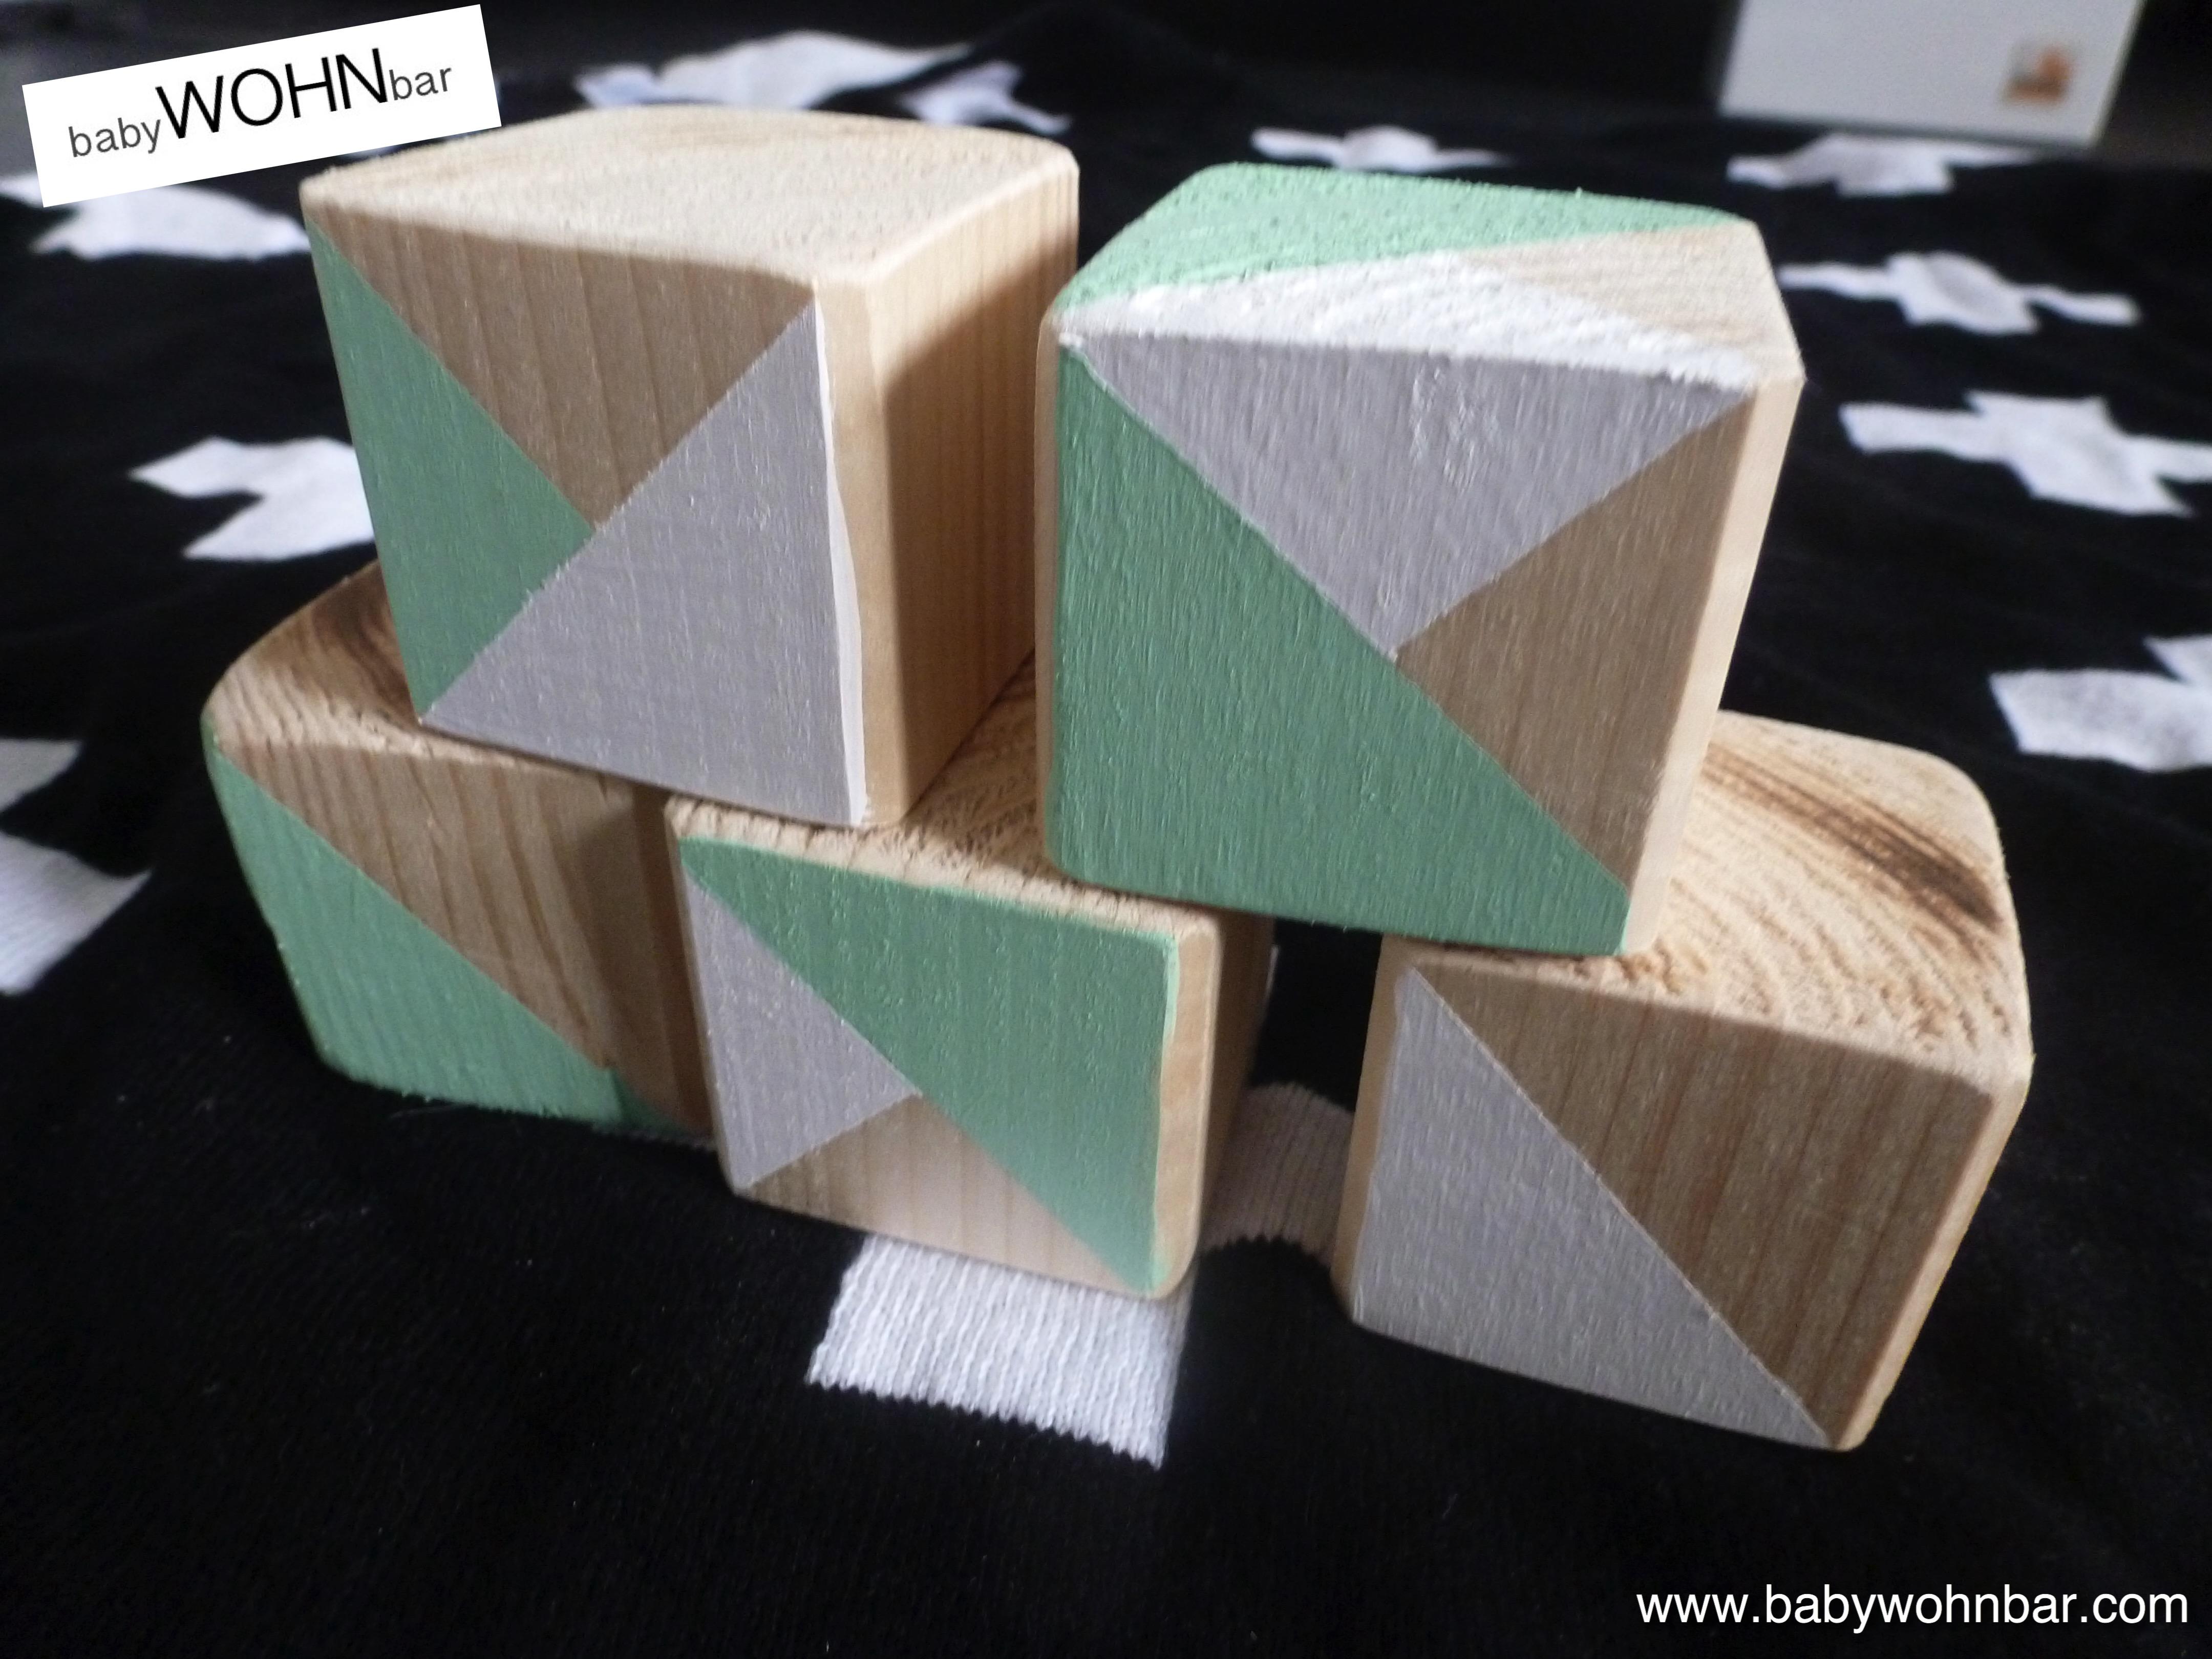 diy individuelle baukl tze mit namen babywohnbar. Black Bedroom Furniture Sets. Home Design Ideas